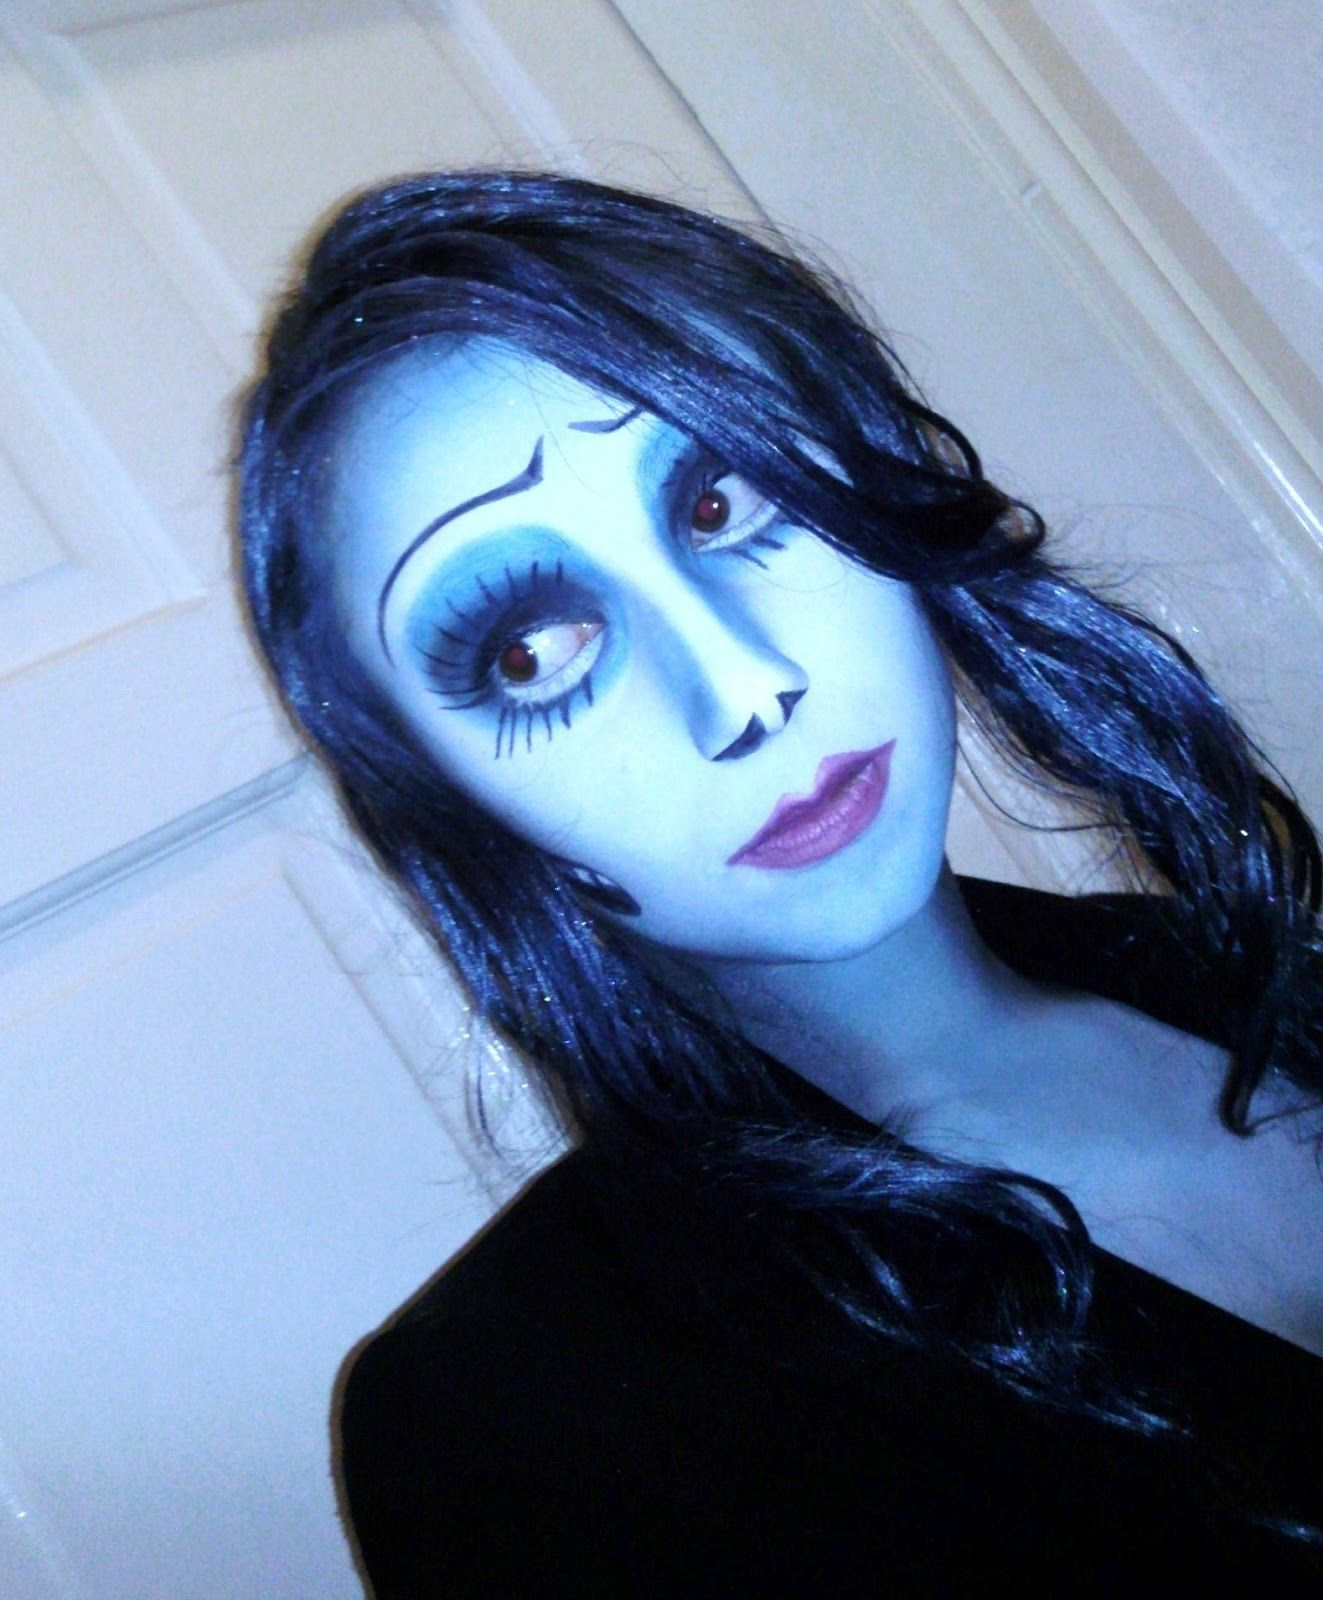 Corpse bride makeup looks real cool halloween pinterest